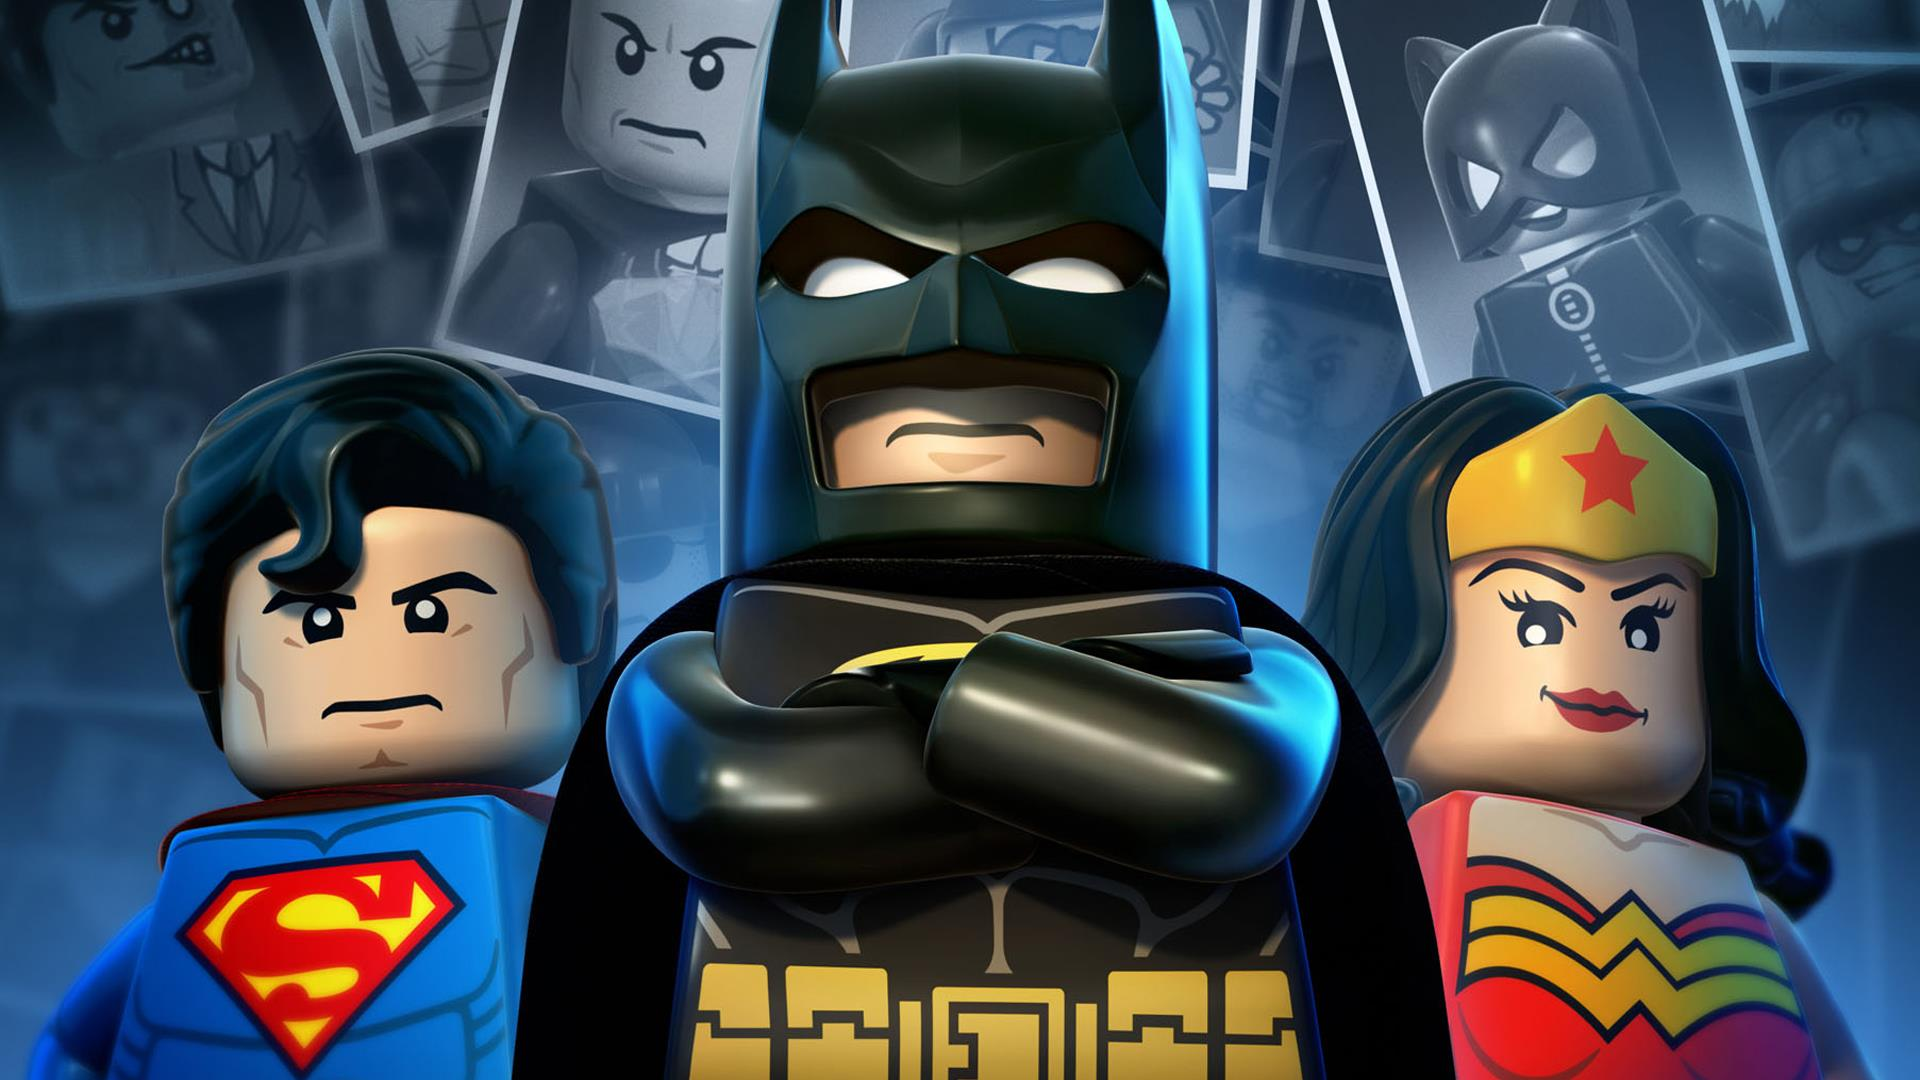 lego batman 2 wallpaper flash - photo #29